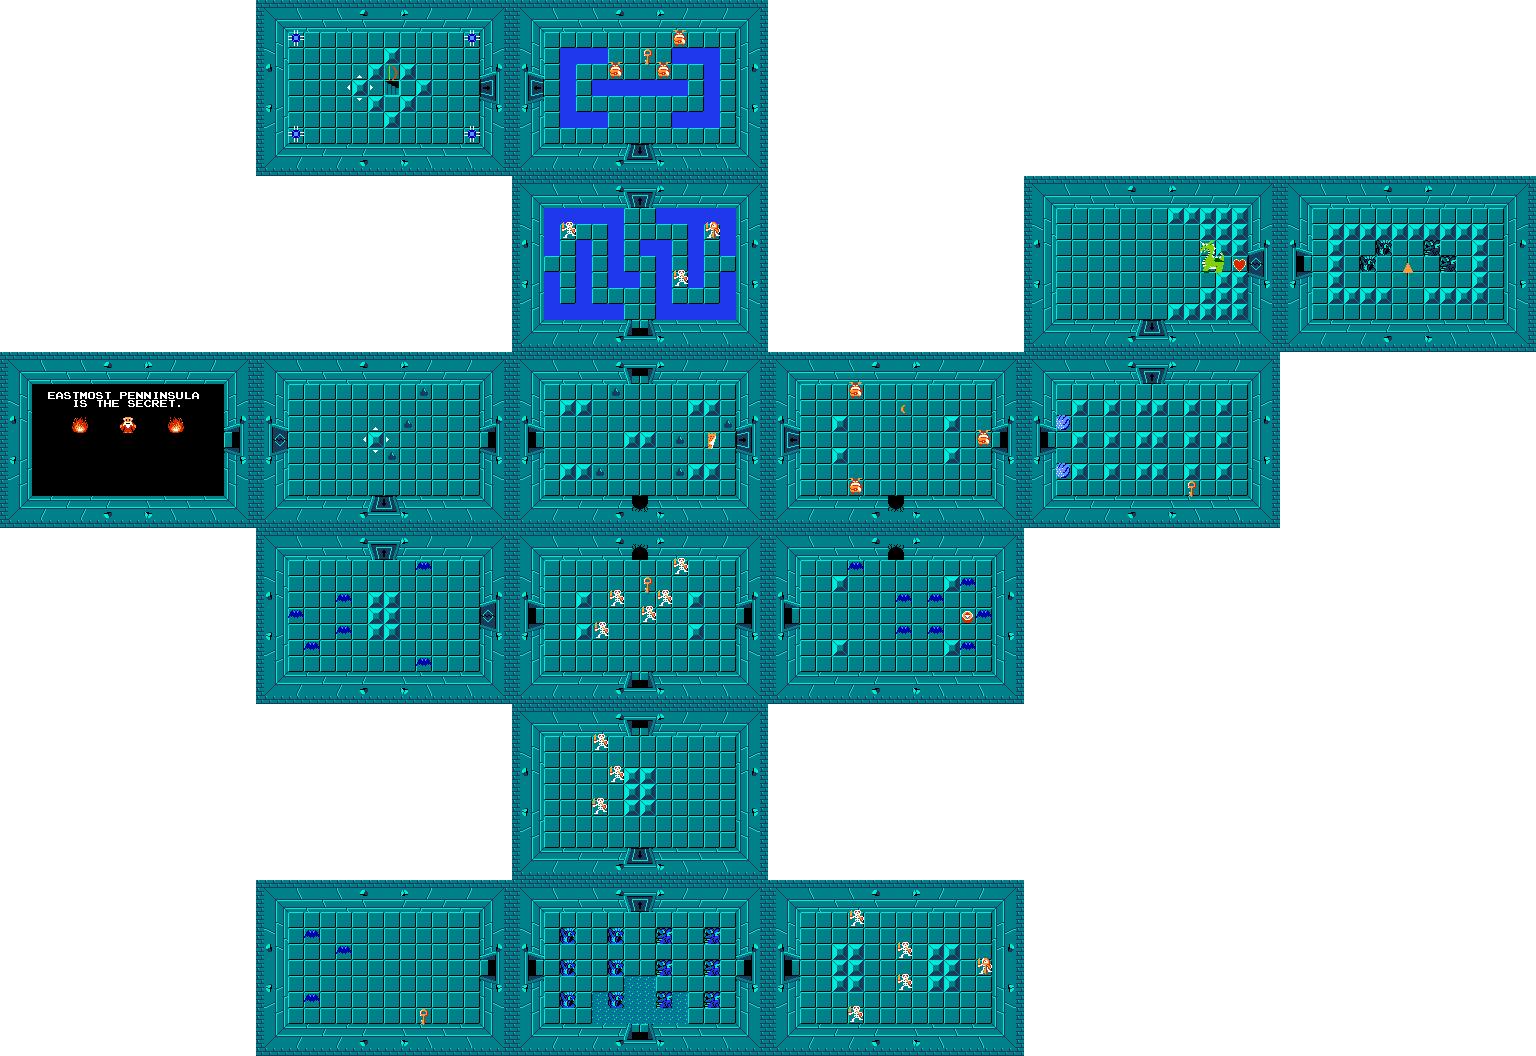 Dungeon 1 Thumbnail - Legend Of Zelda Level 1 (1536x1056), Png Download